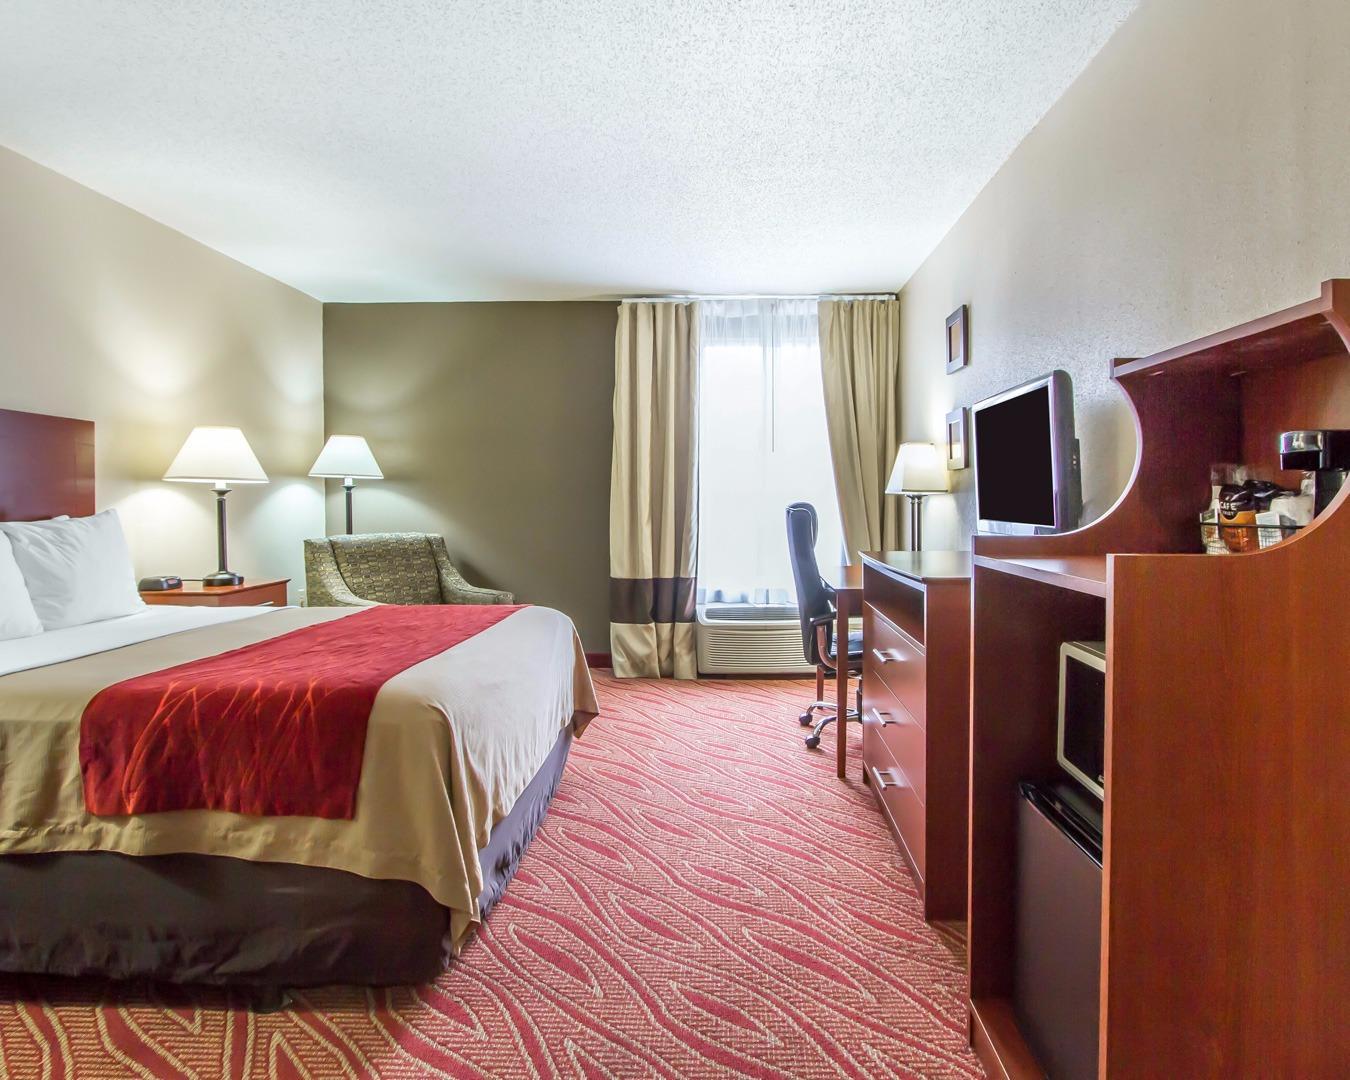 Comfort Inn, Poplar Bluff MO